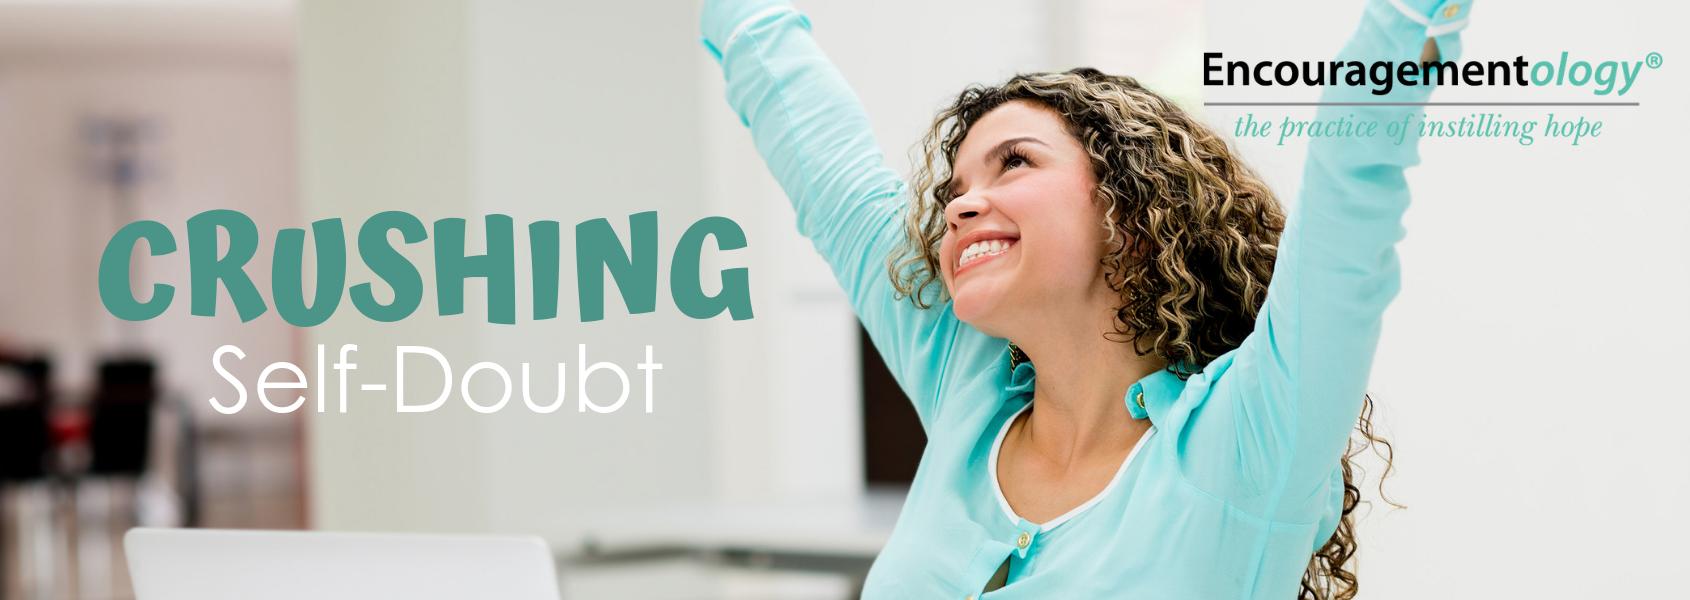 crushing self-doubt